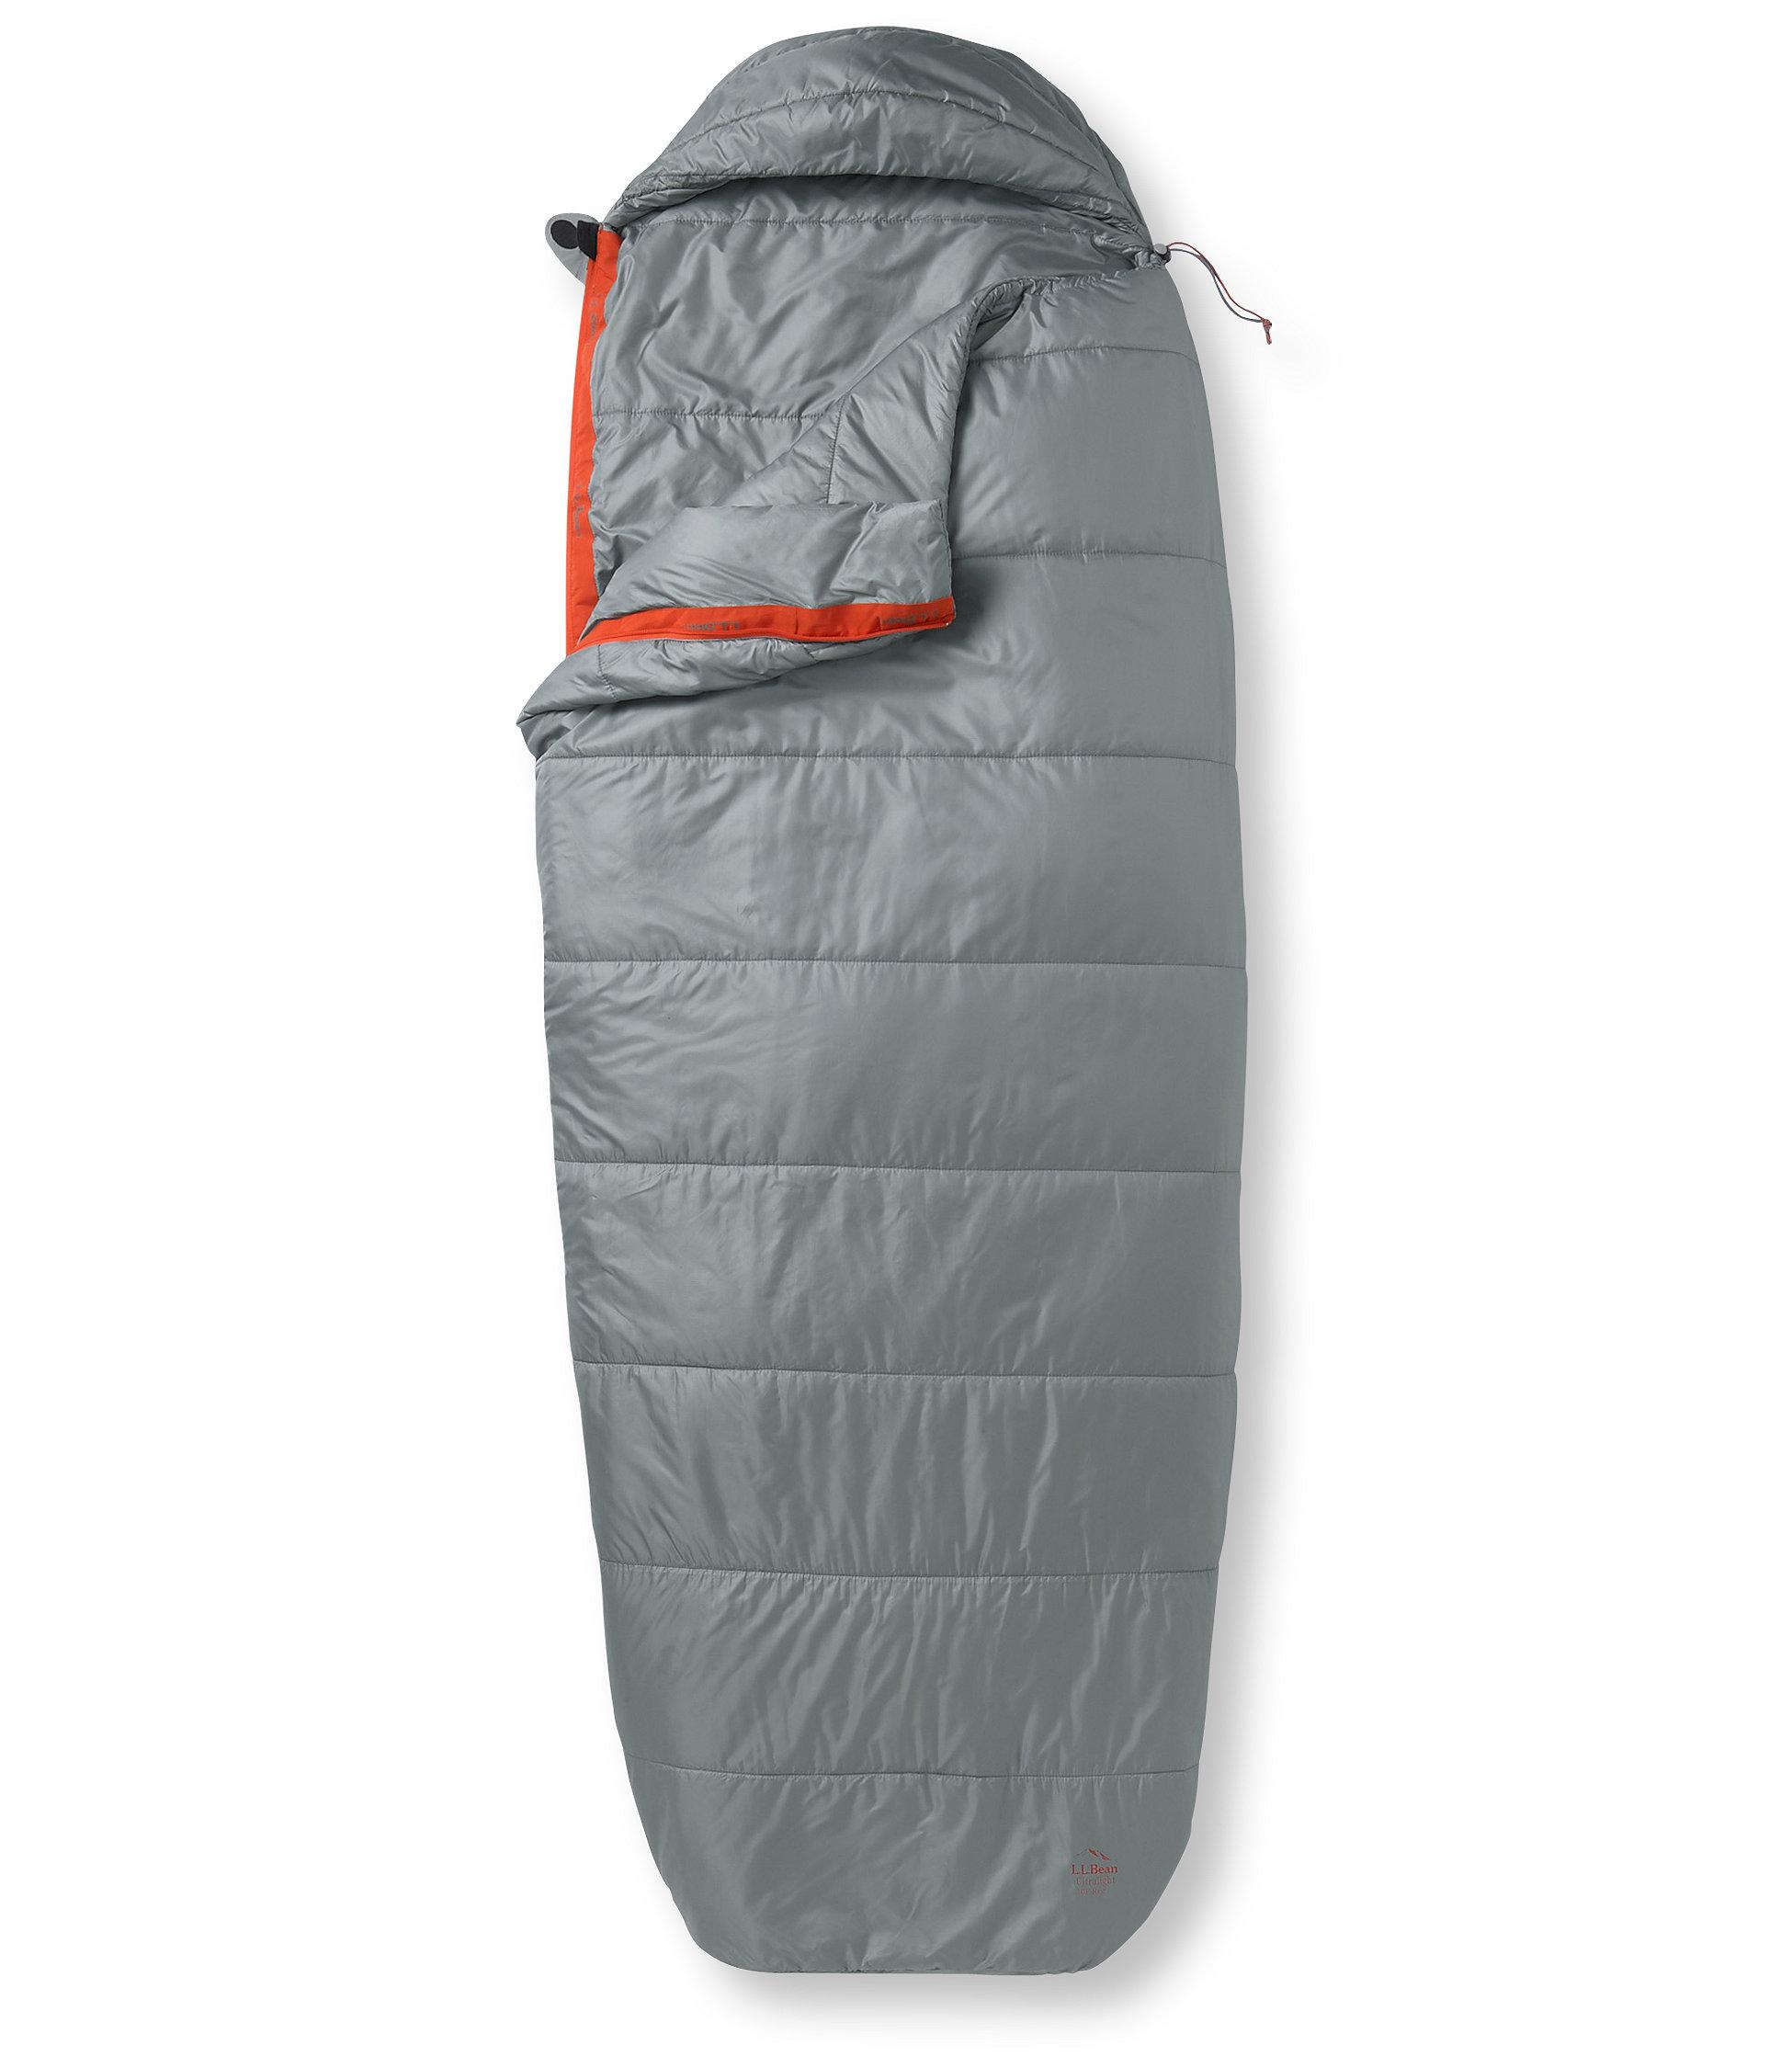 photo: L.L.Bean Ultralight Sleeping Bag 30F 3-season synthetic sleeping bag